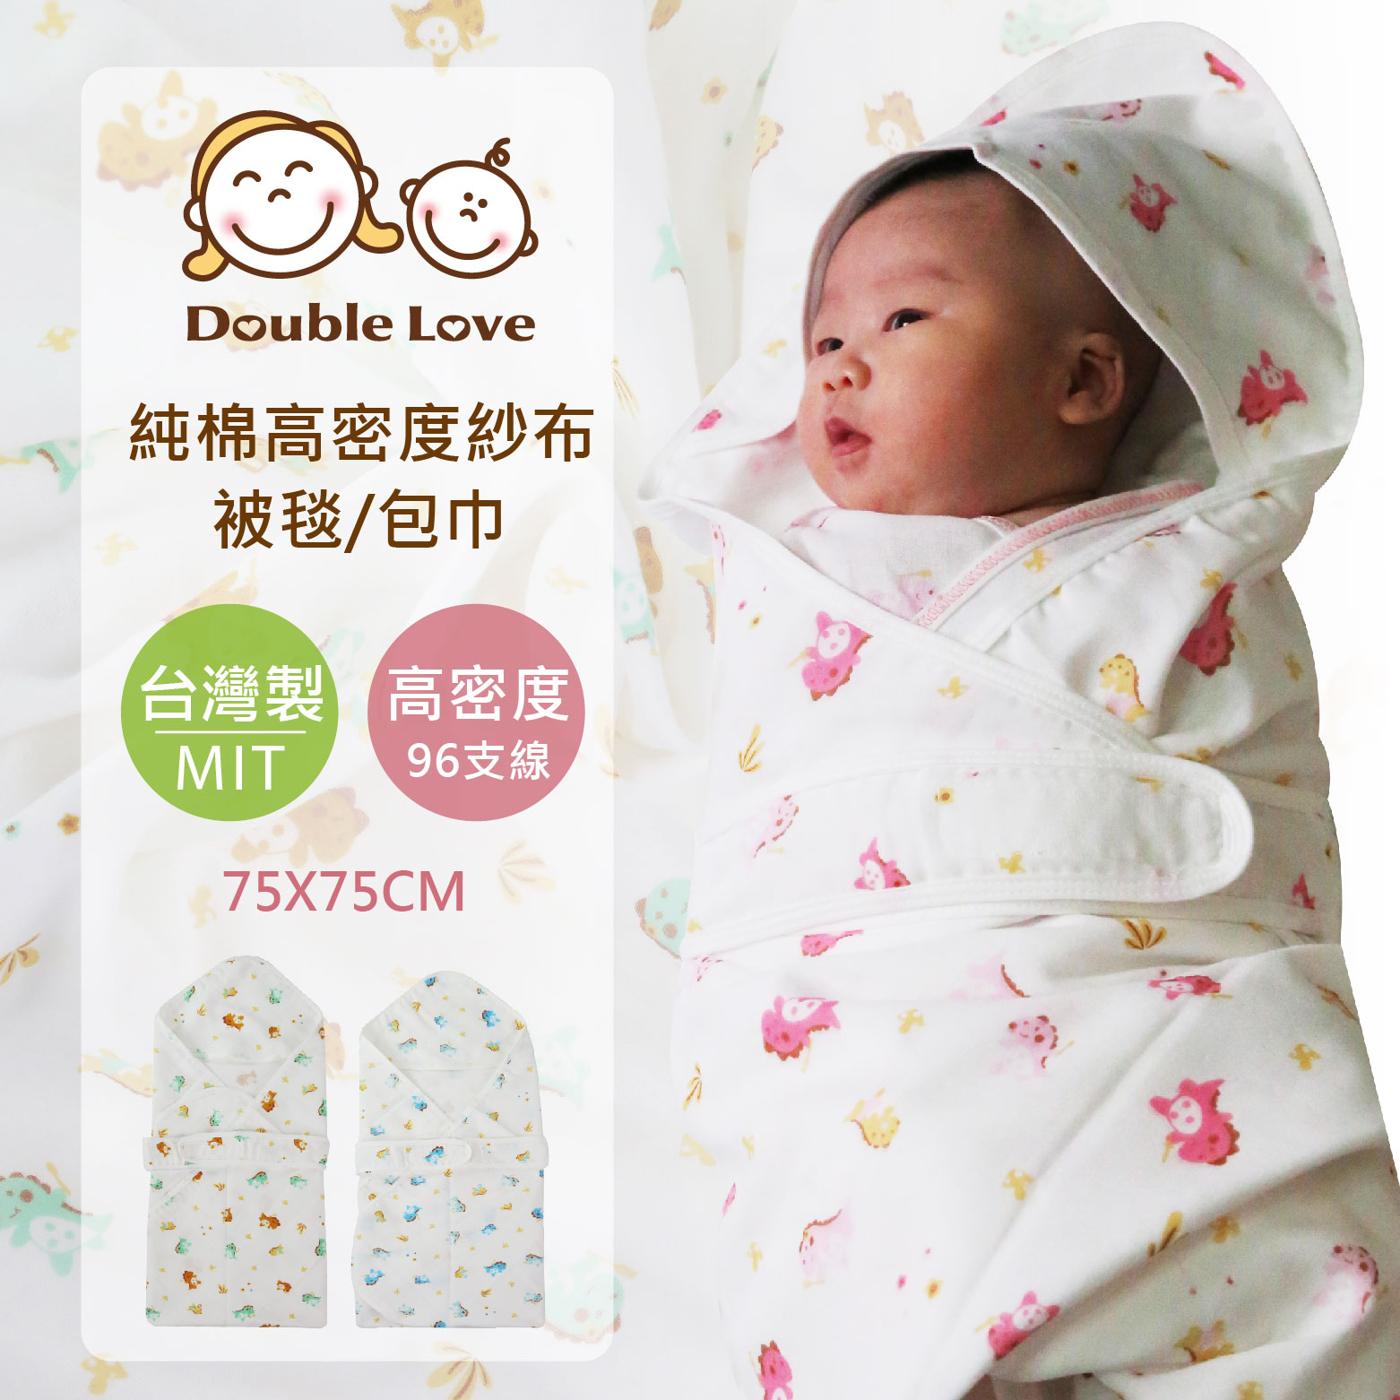 DL紗布包巾附束帶JA0083台灣製高密度三層紗布包巾新生兒抱毯嬰兒睡袋75*75紗布衣恐龍